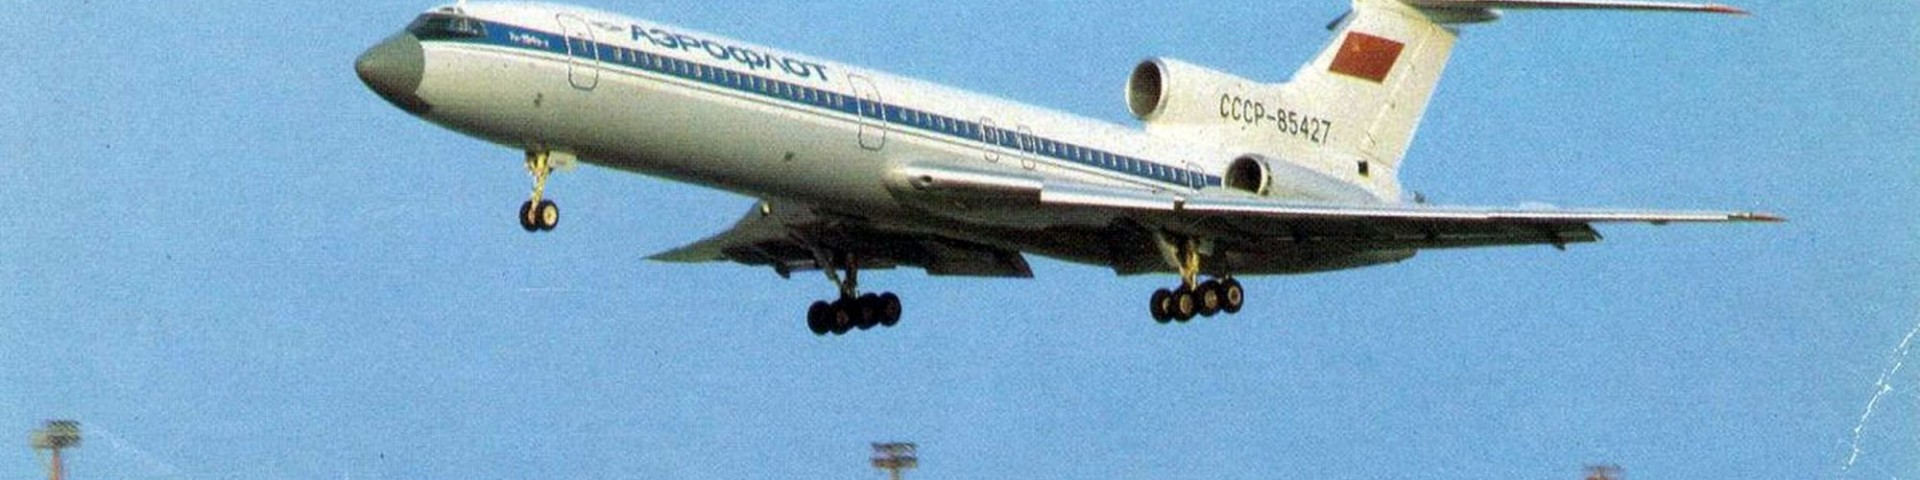 Ту-154 Аэрофлот